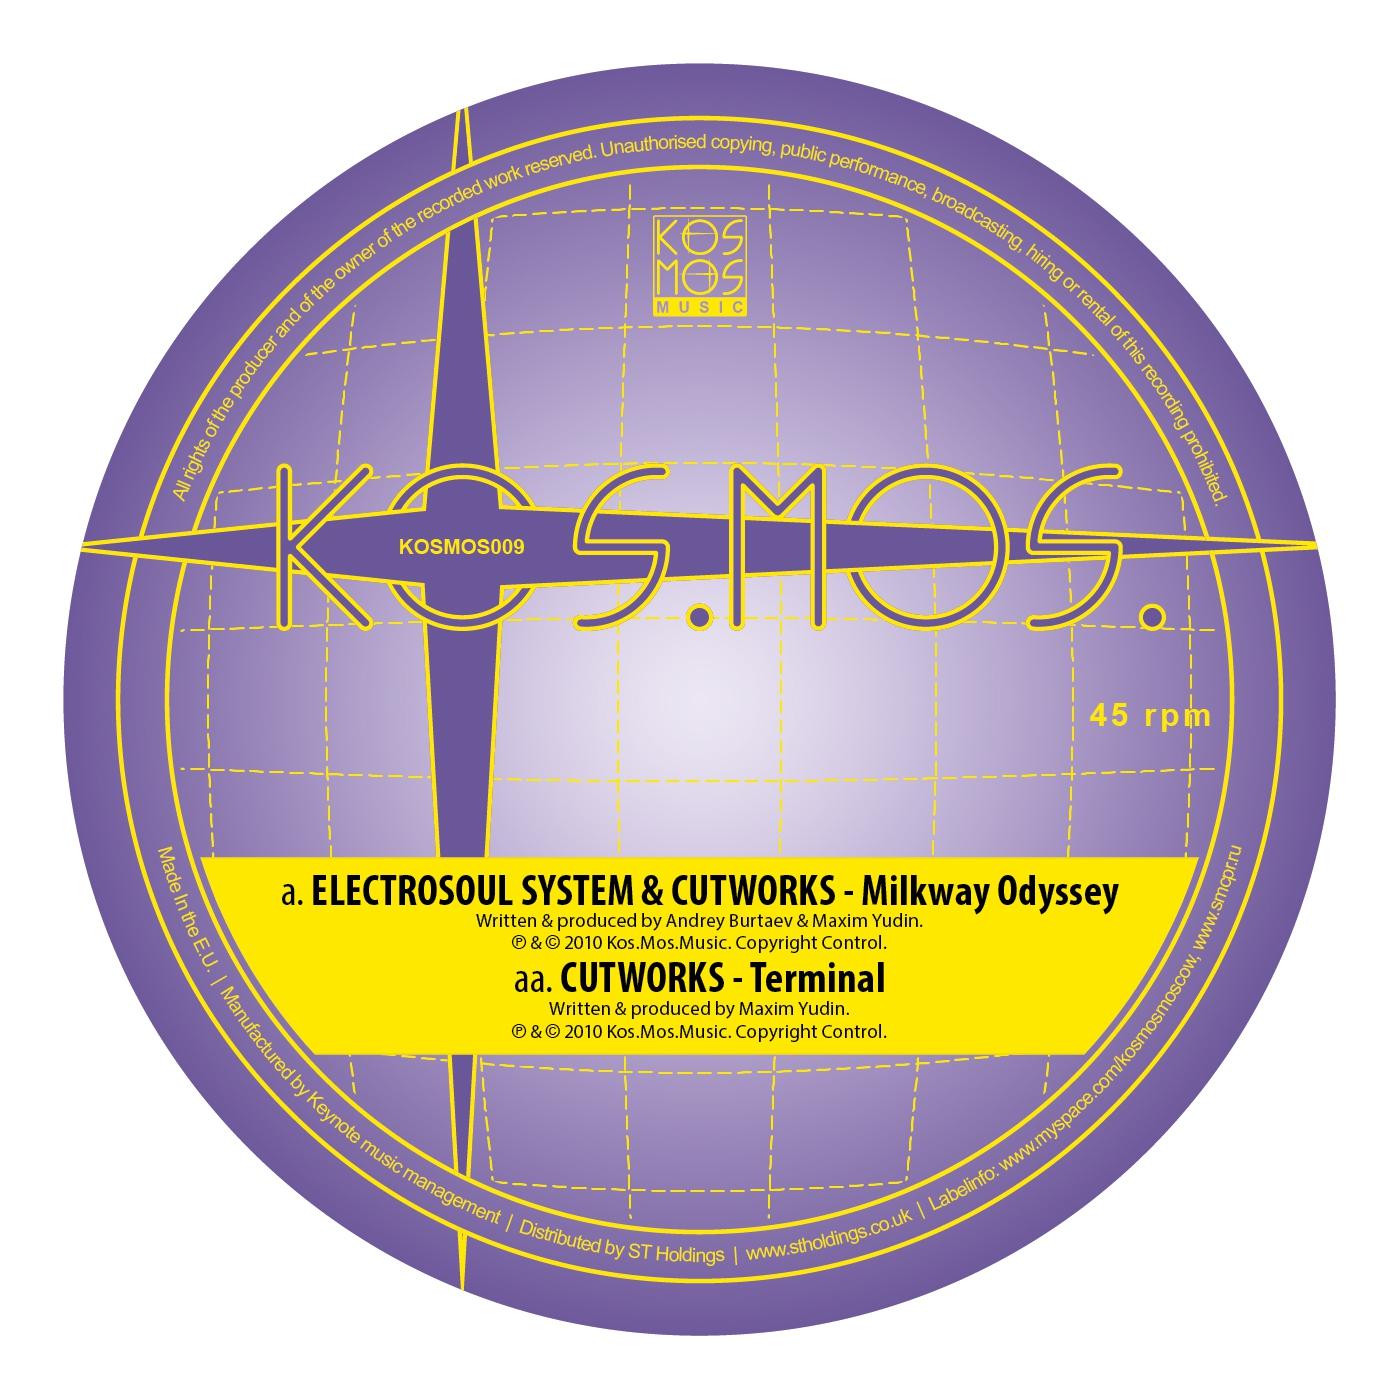 Electrosoul System & Cutworks - Milkway Odyssey (Original Mix)